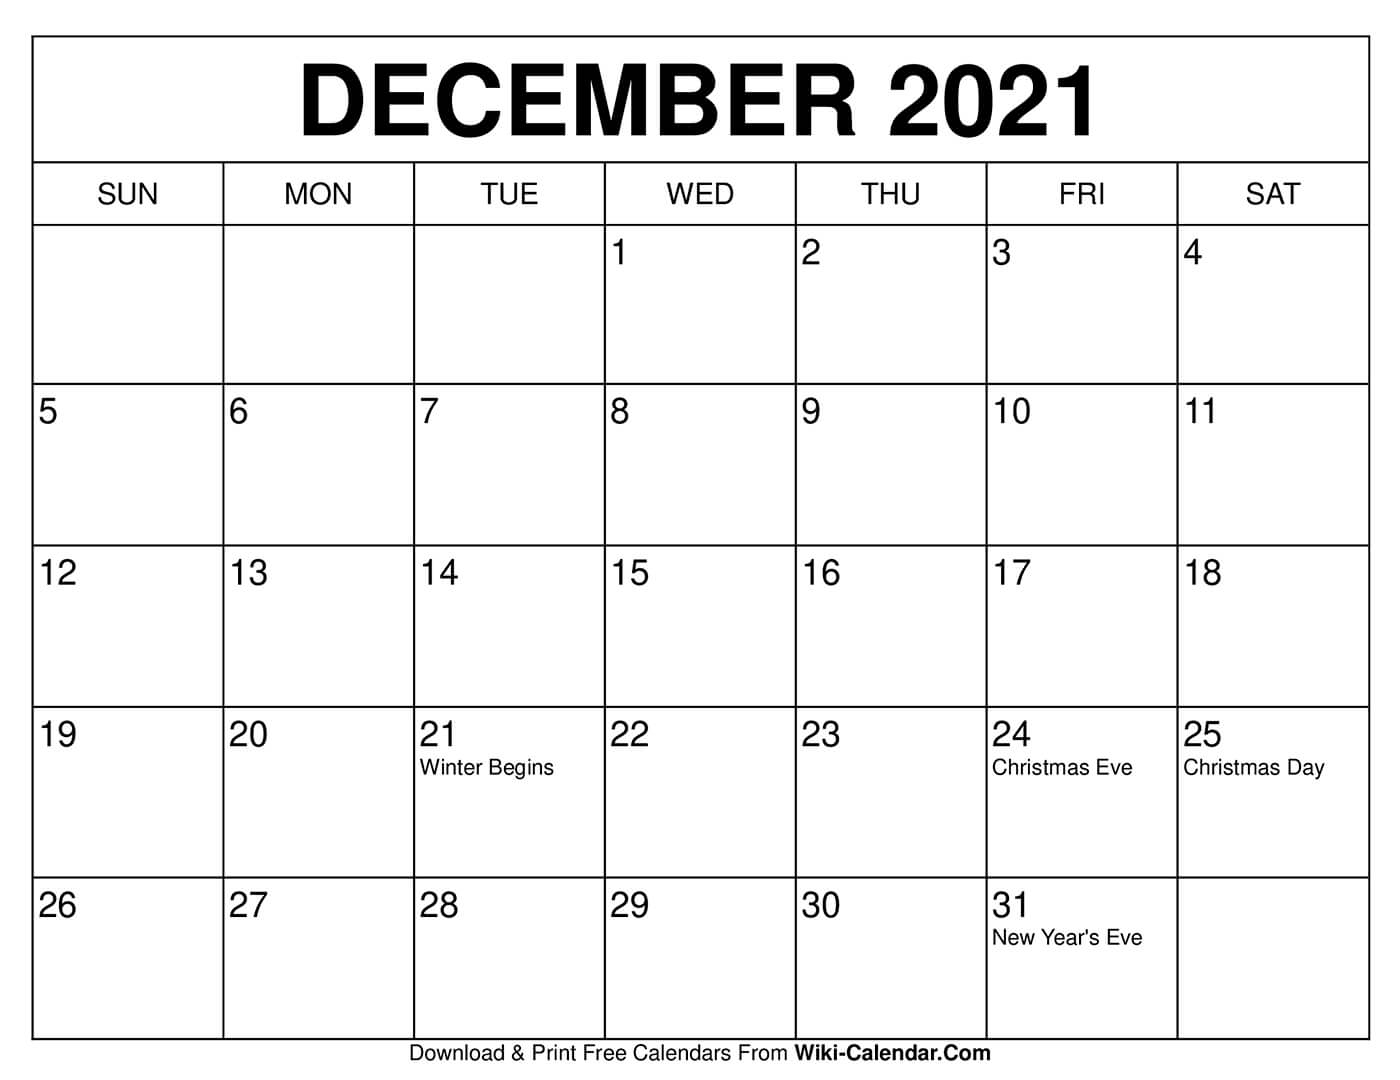 Free Printable December 2021 Calendars